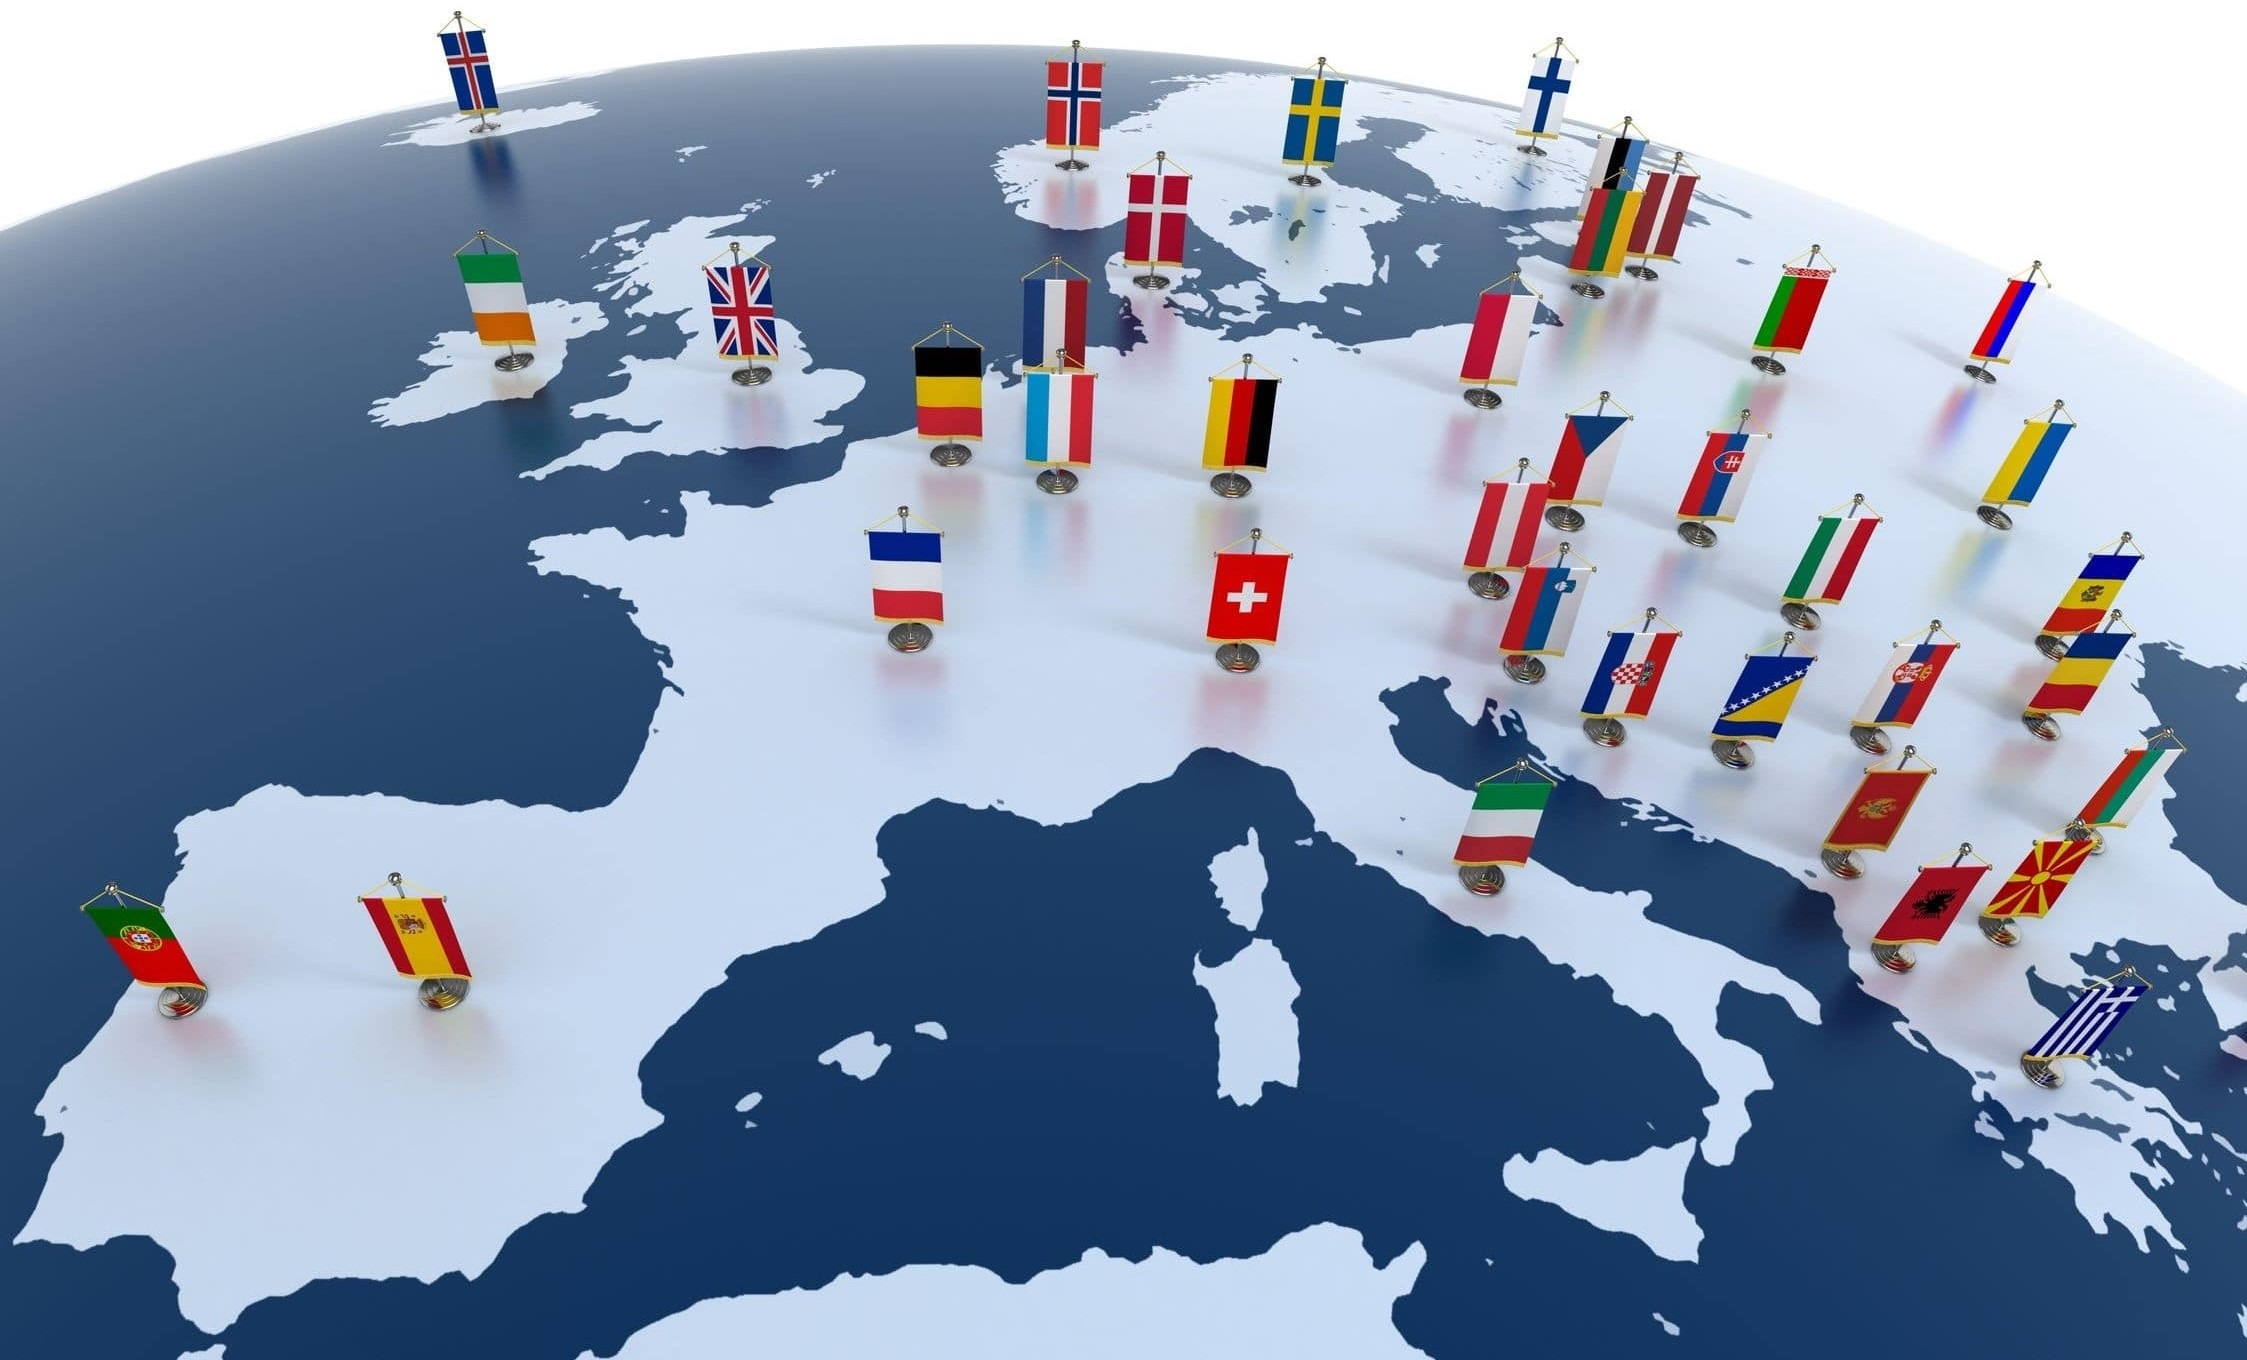 MAPA DE EUROPA CON BANDERAS